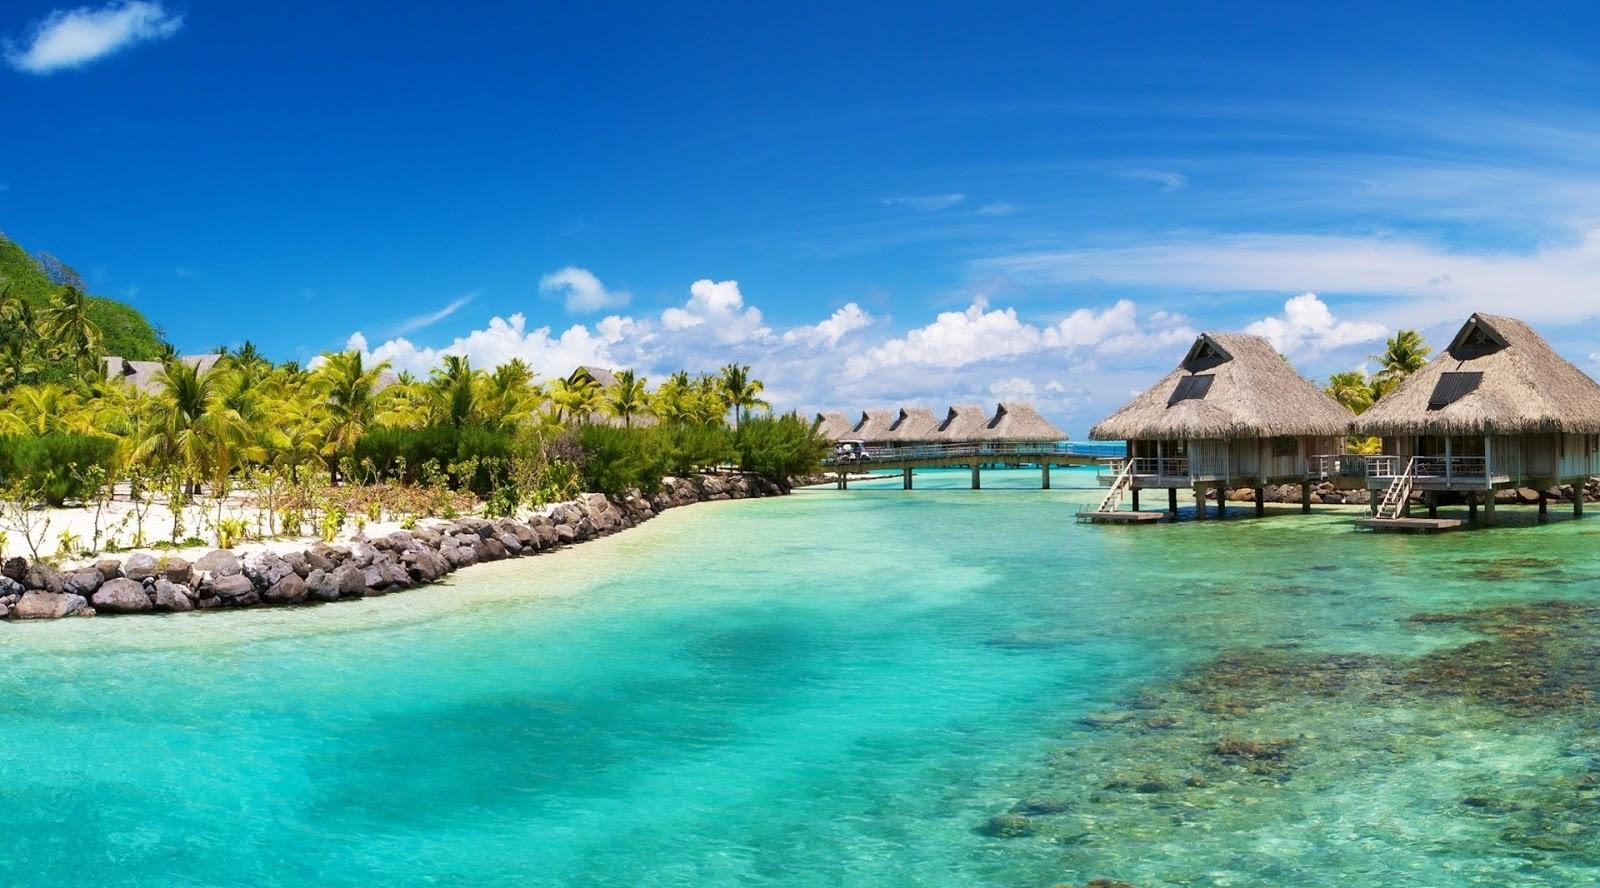 wisata utama indonesia pulau derawan